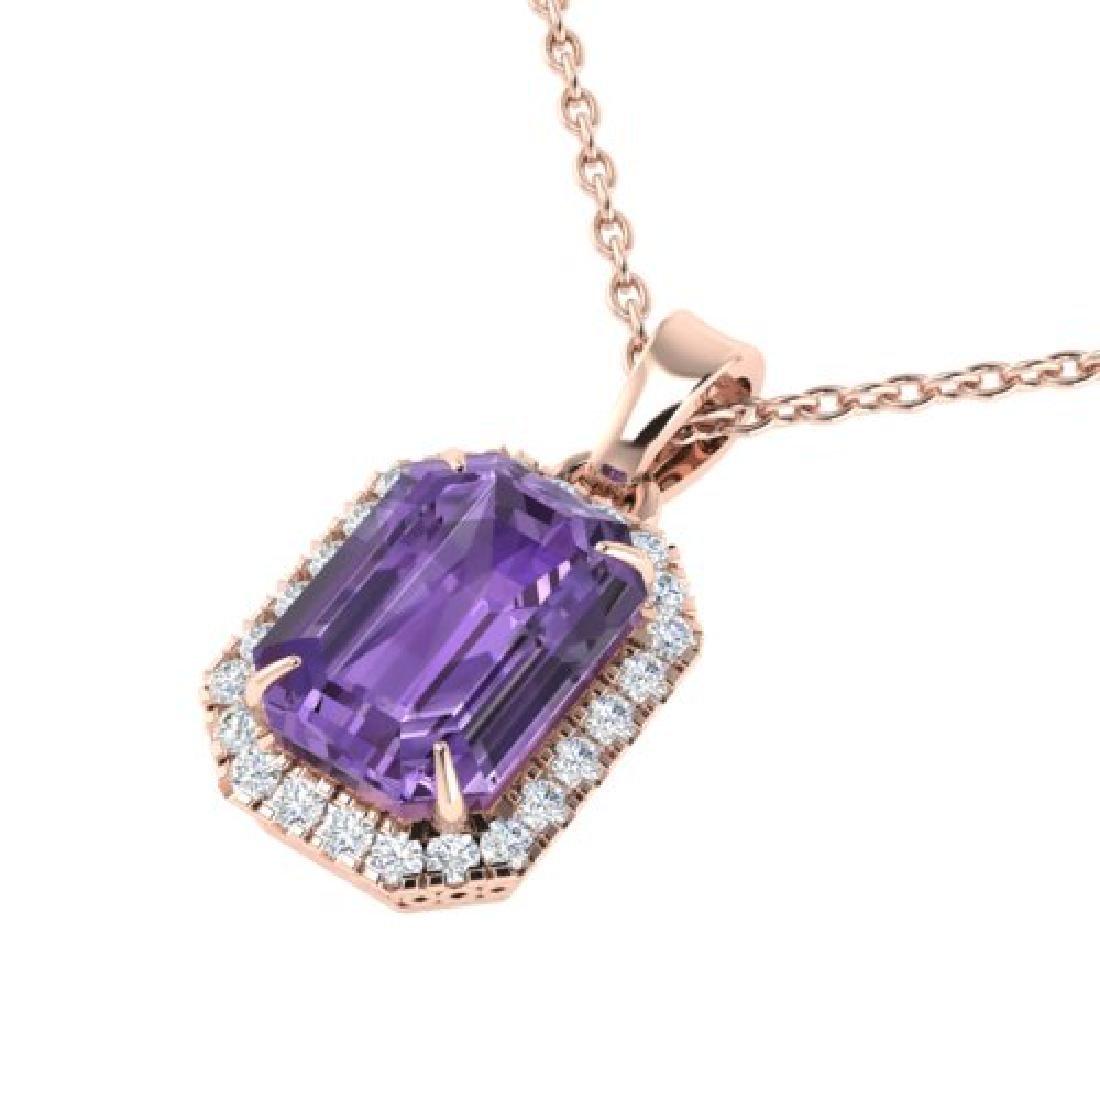 5 CTW Amethyst & Micro Pave VS/SI Diamond Halo Necklace